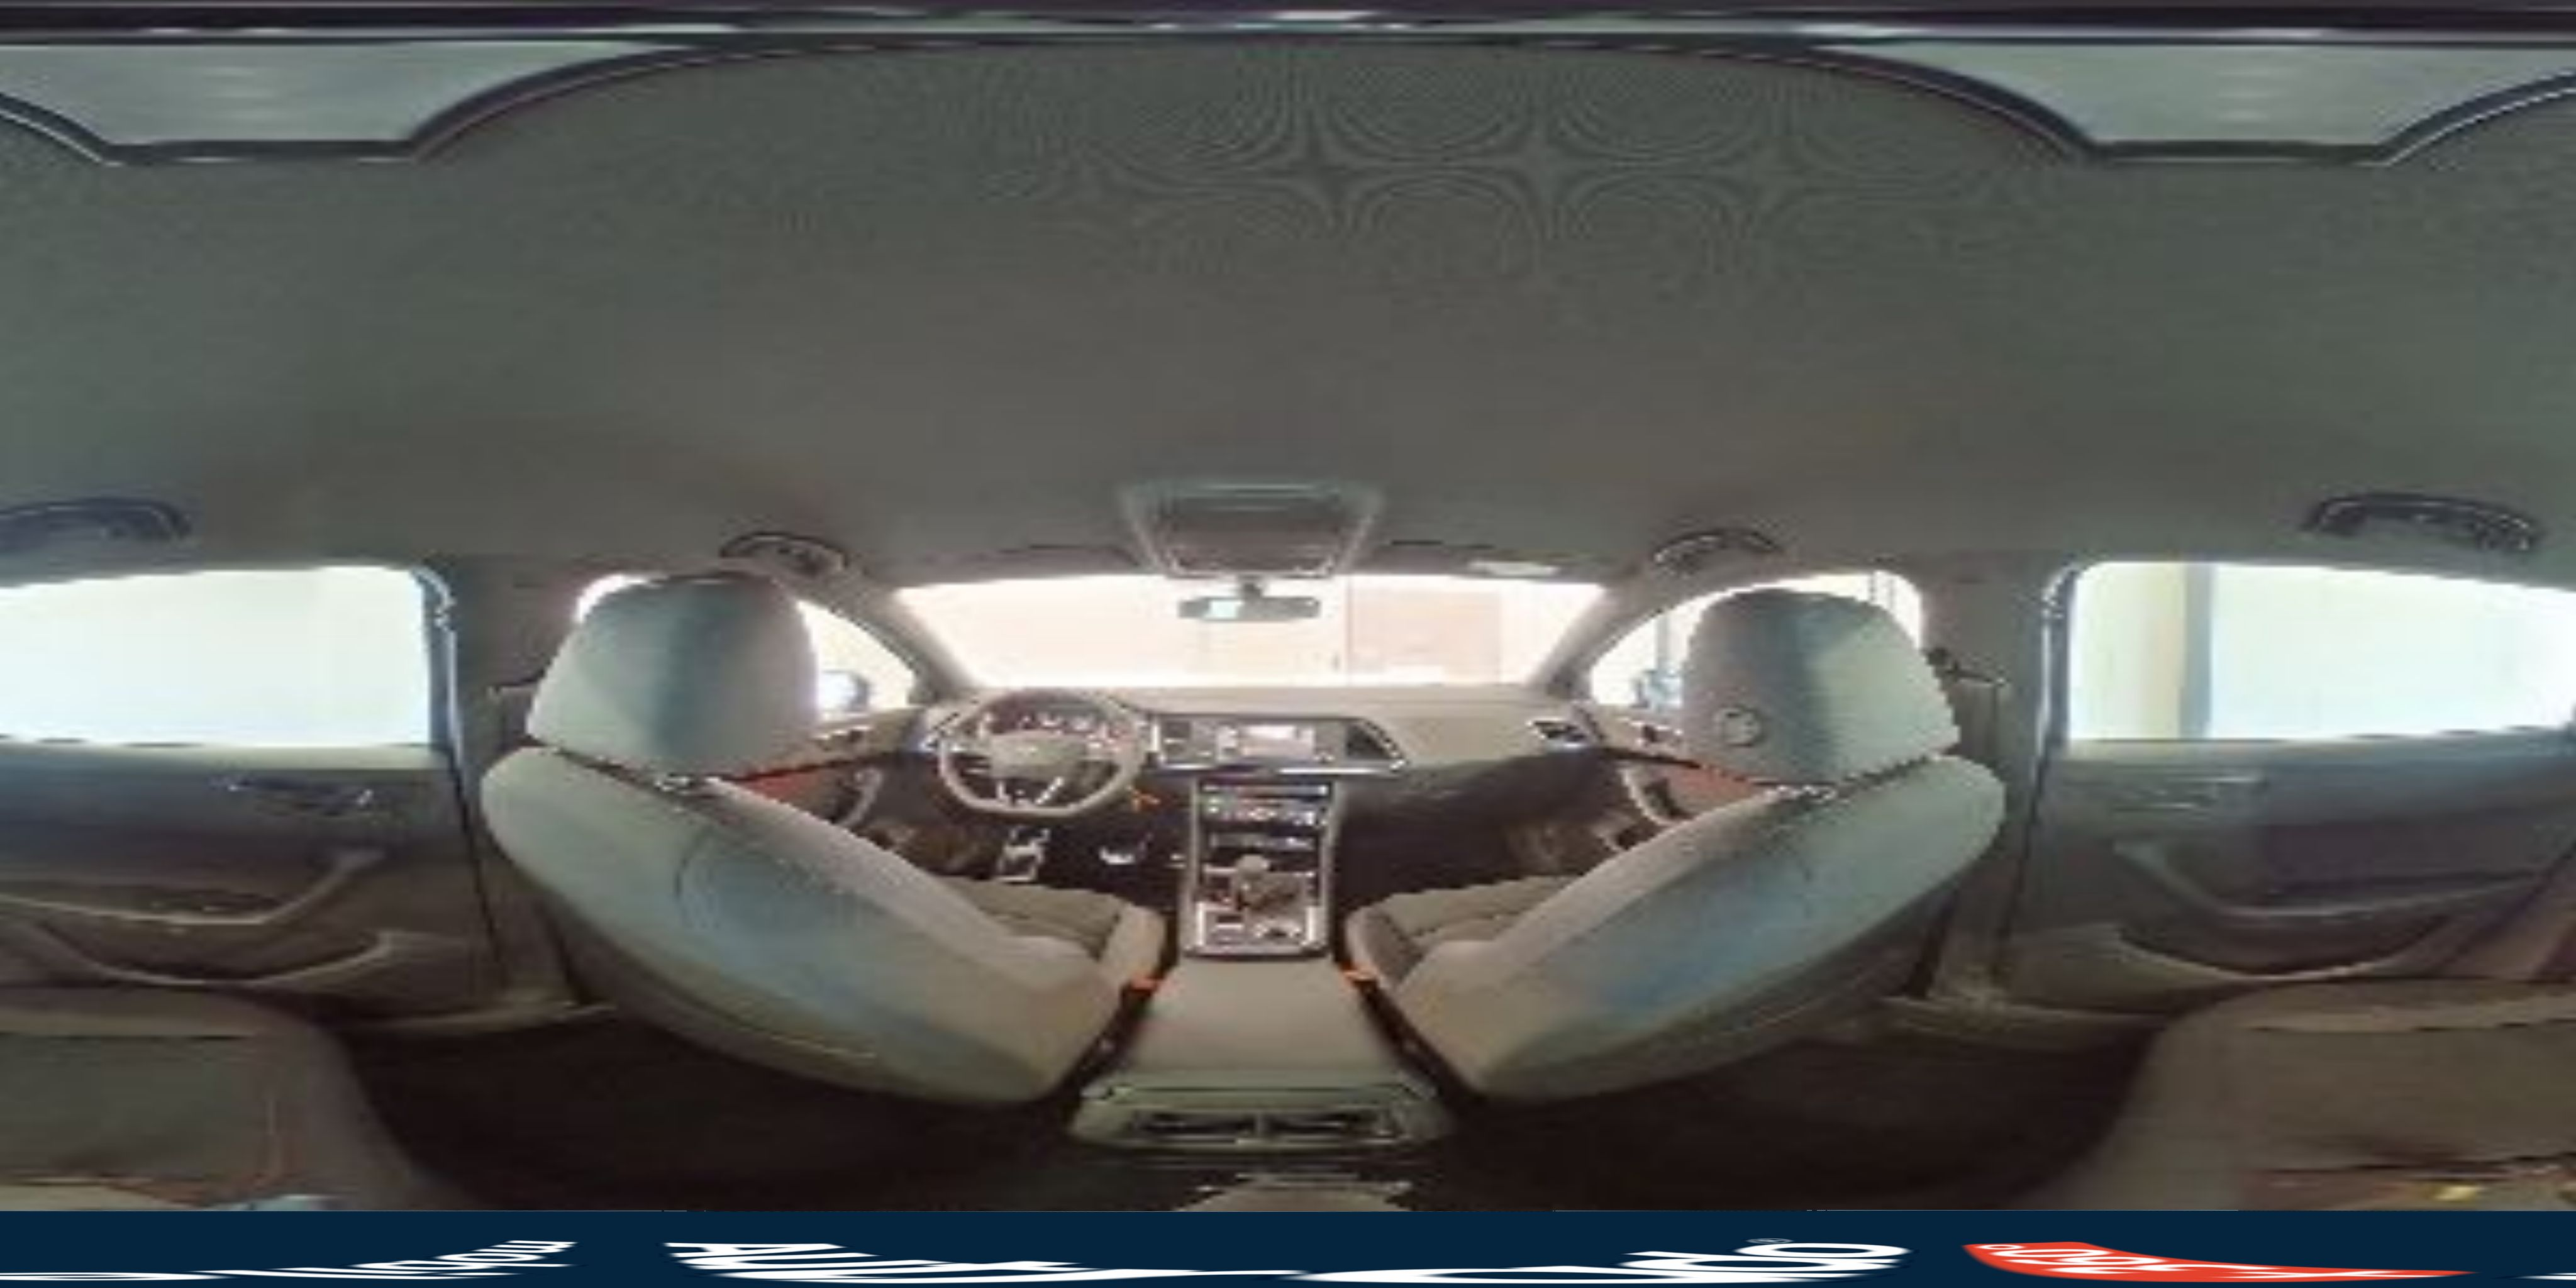 Seat Ateca FR GVL 36 Monate WLTP 2.0 TDI DSG 4Drive 110kW / 150PS